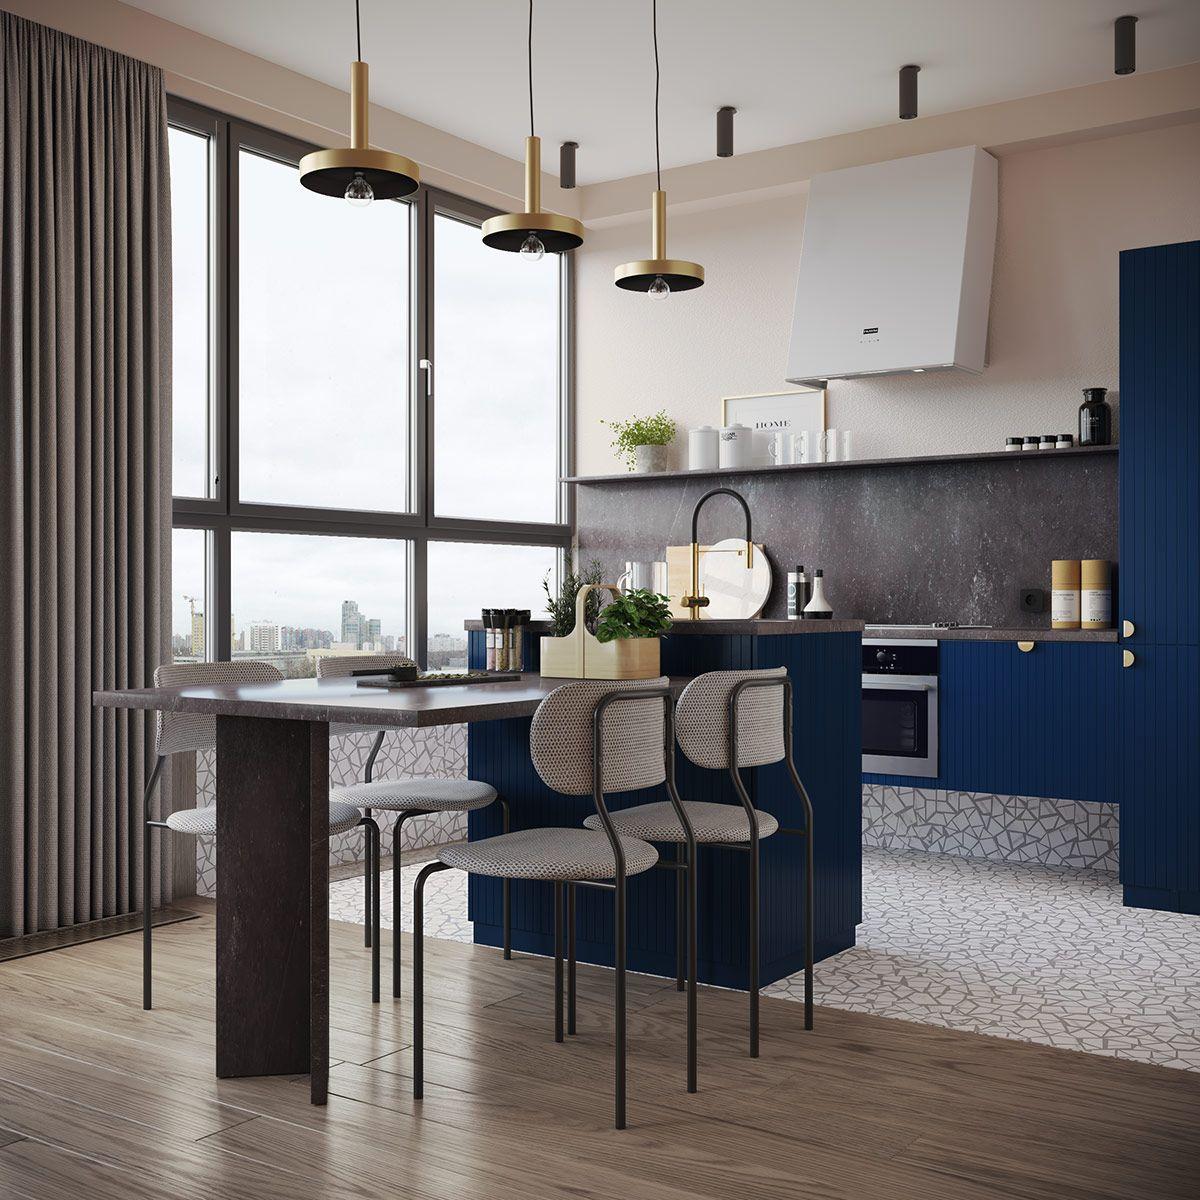 Diy Blue Interior Design: Interior Design Using Orange & Blue: Tips To Help You